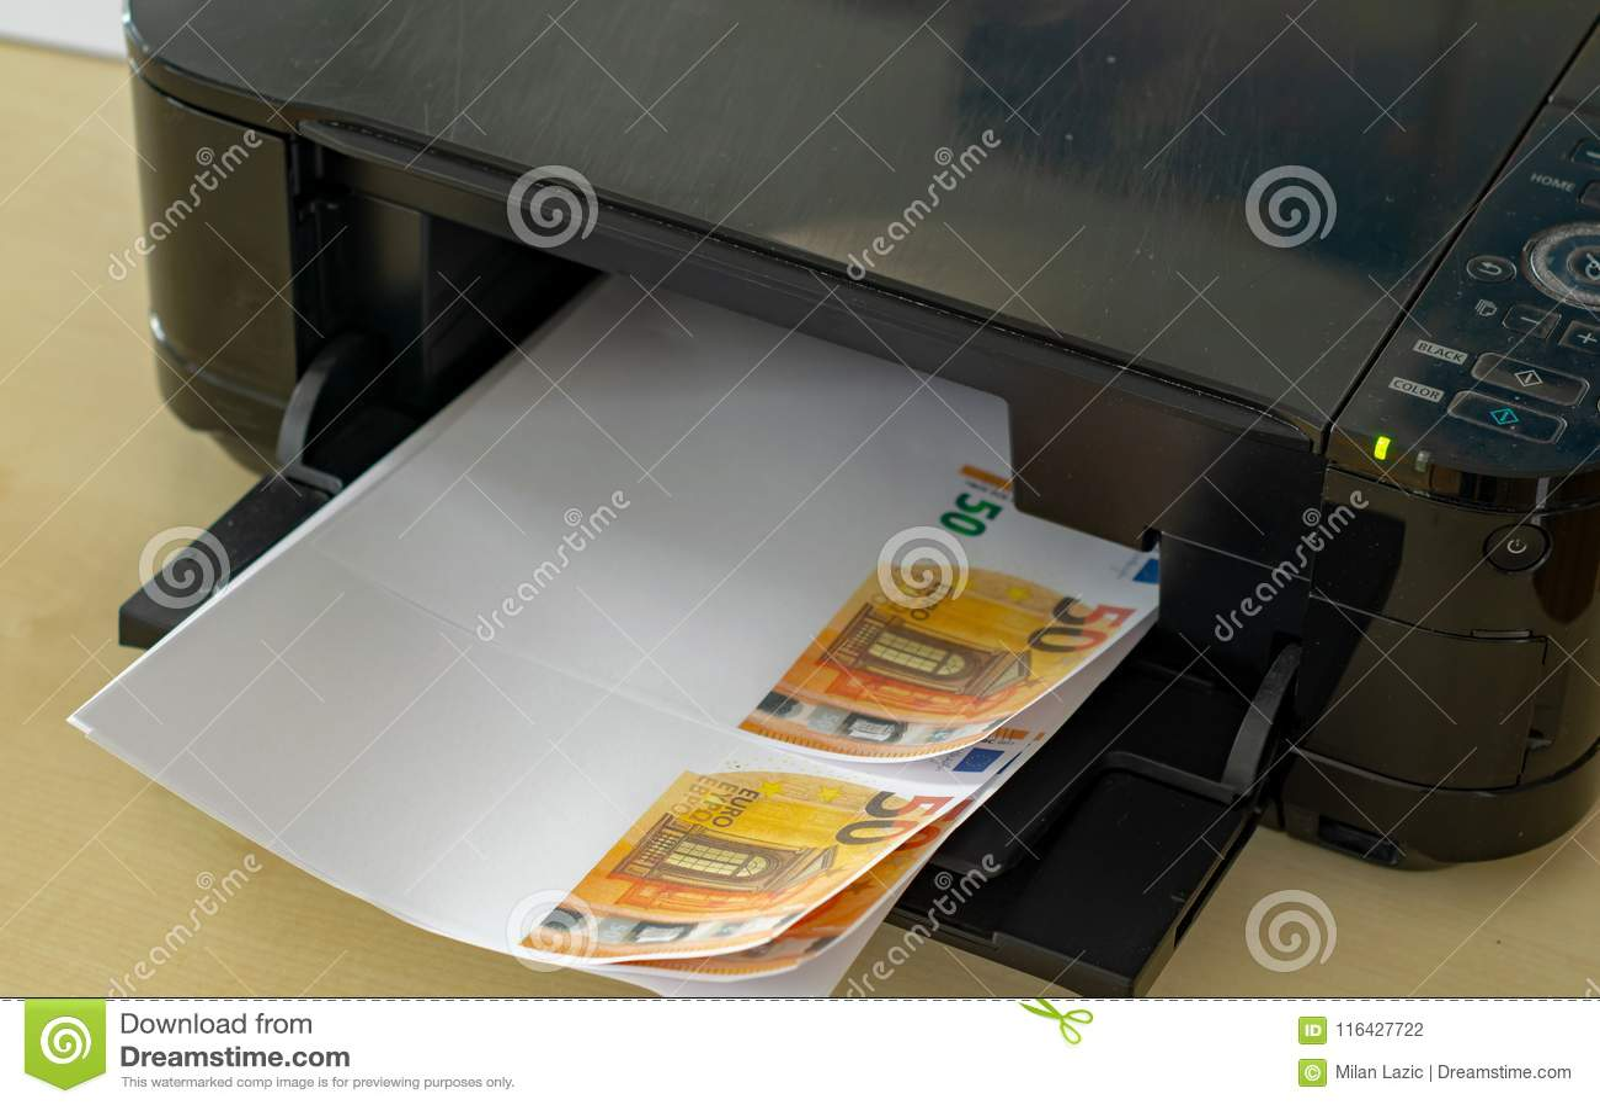 Himself Printing His Counterfeit Money Stock Photo - Image